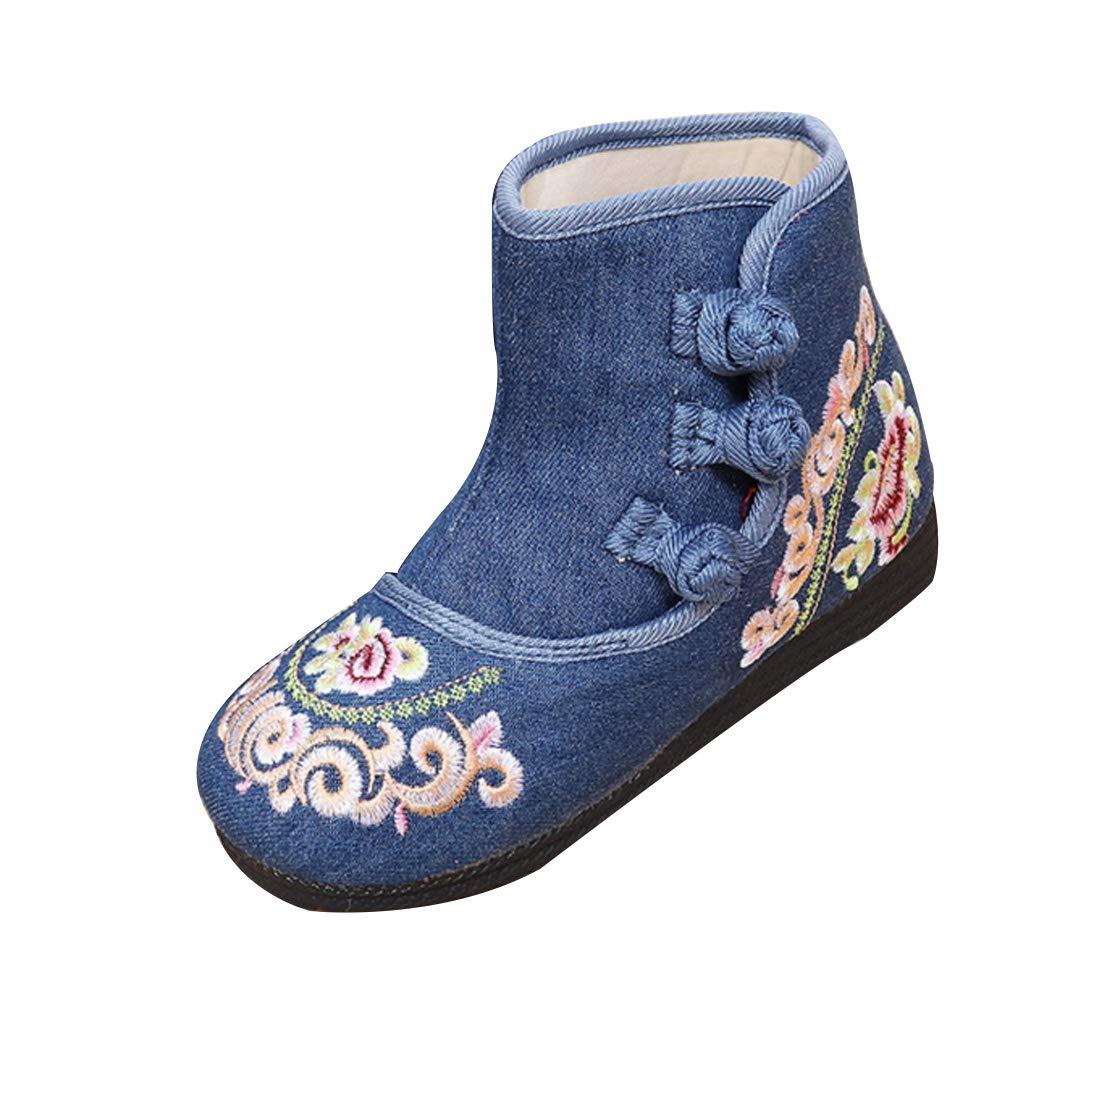 Inlefen Girls Embroidered Boot Tendon Bottom Buckle Strap Cotton Short Boot